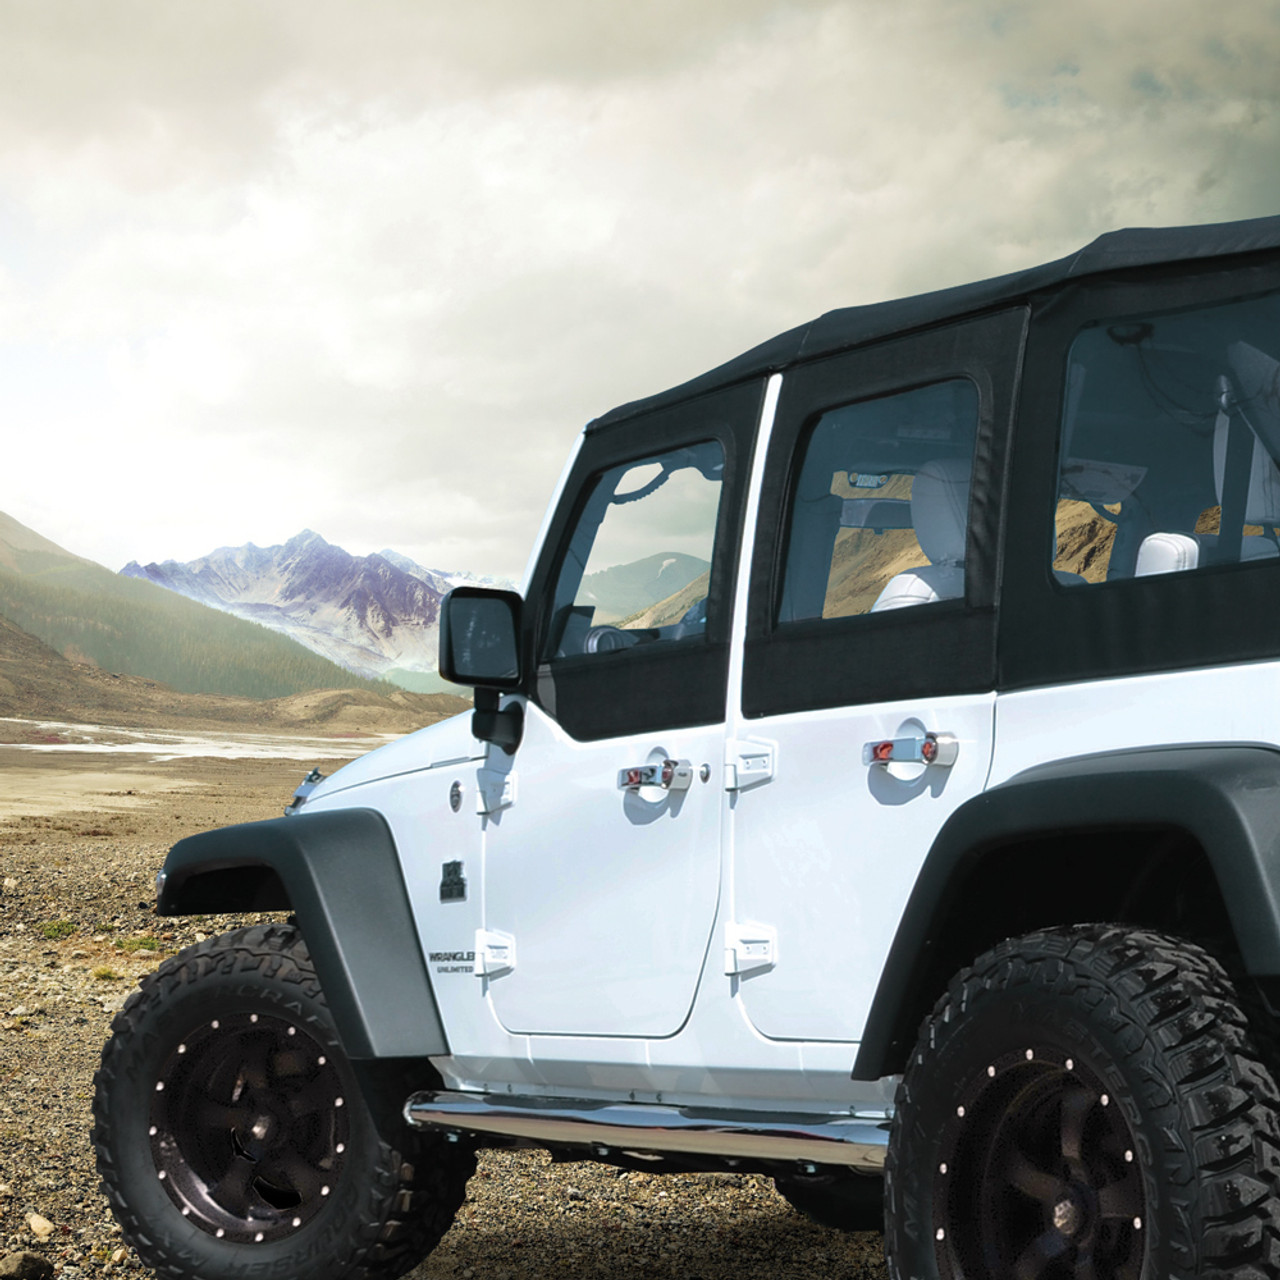 Jeep Leveling Kit >> Jeep Wrangler Jk 3 4 Leveling Kit